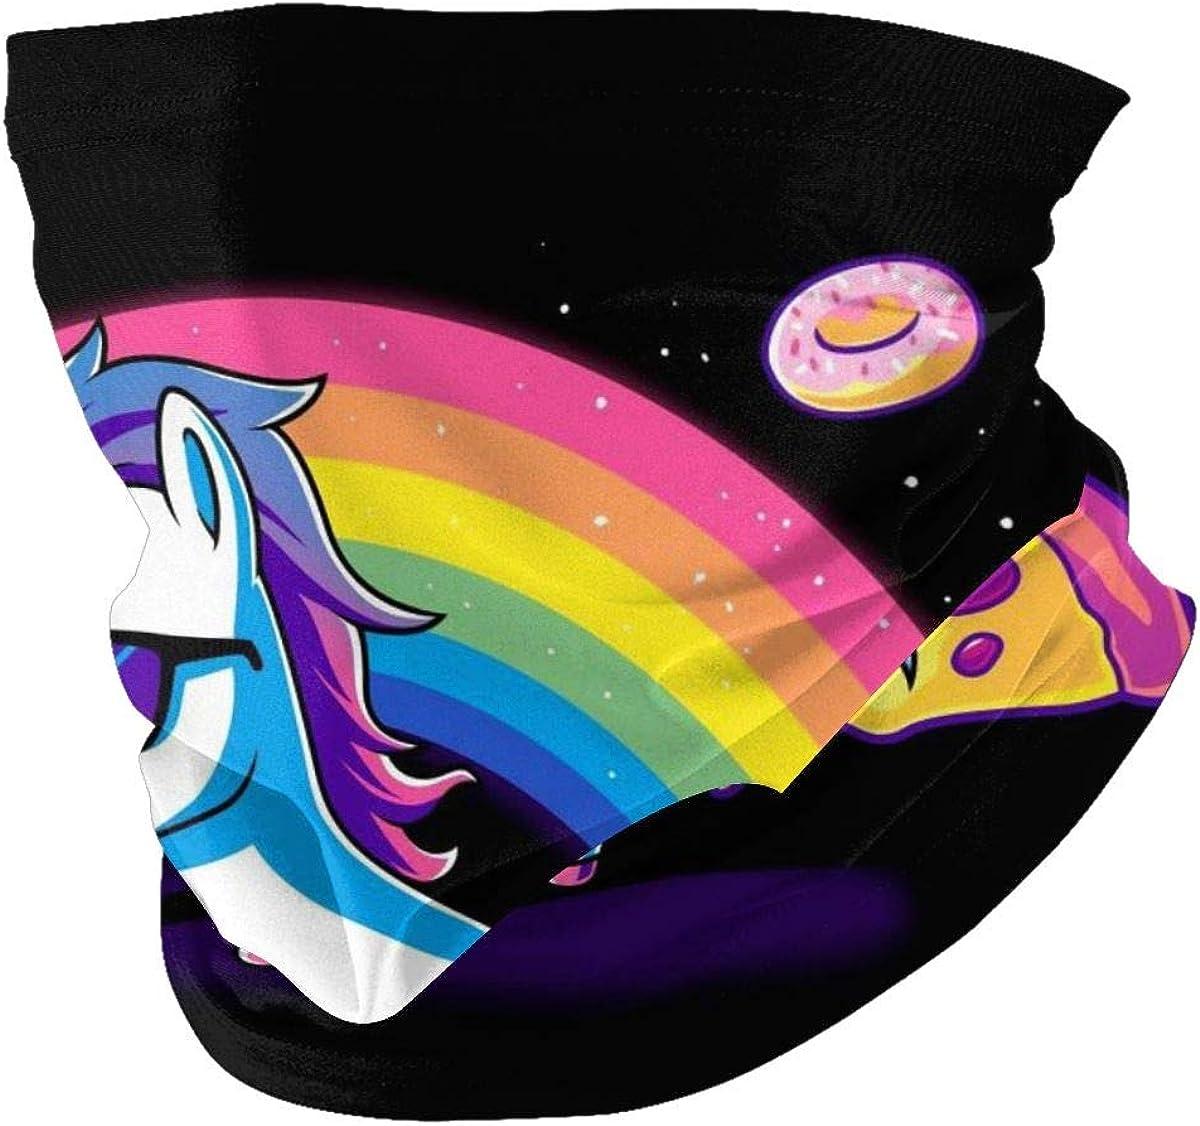 Pizza Donut Funny Cute Nerdy Unicorn Unisex Multi-Purpose Bandana Scarf Neck Gaiter Headwear Headwrap for Sun Dust Protection Black